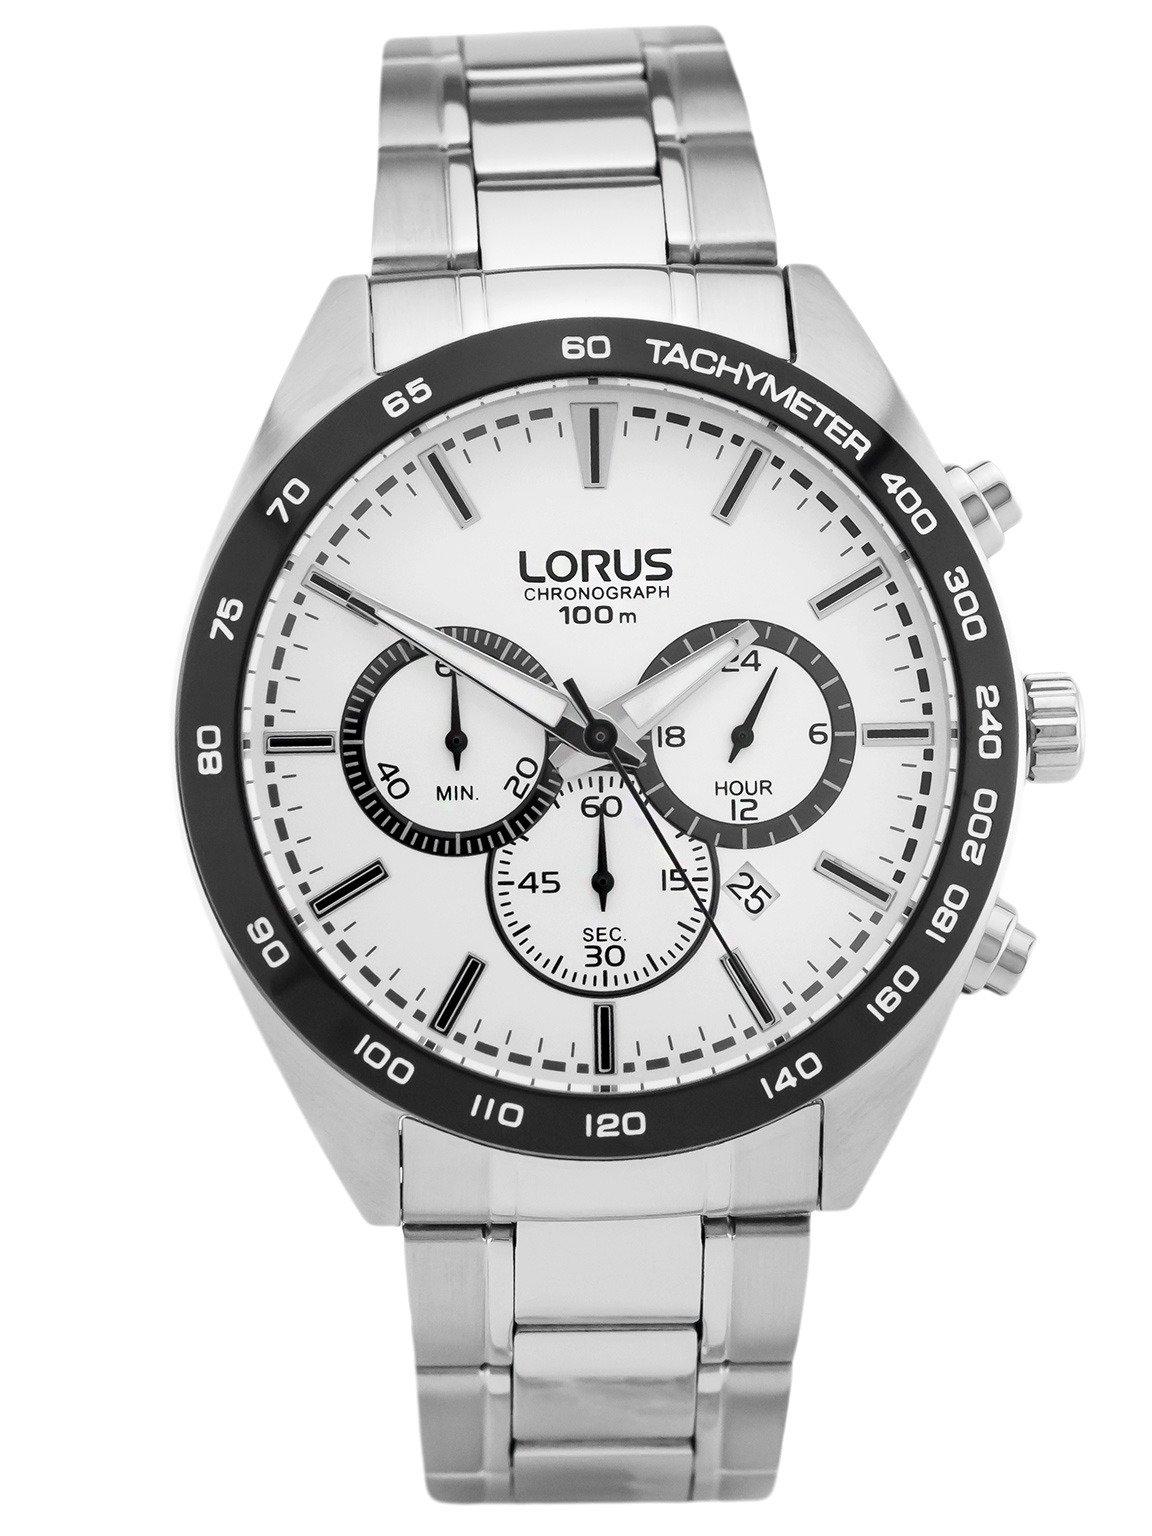 7bade1349e19e5 Zegarek męski LORUS RT301GX9 269,00 zł cena tanio najtaniej opinie ...